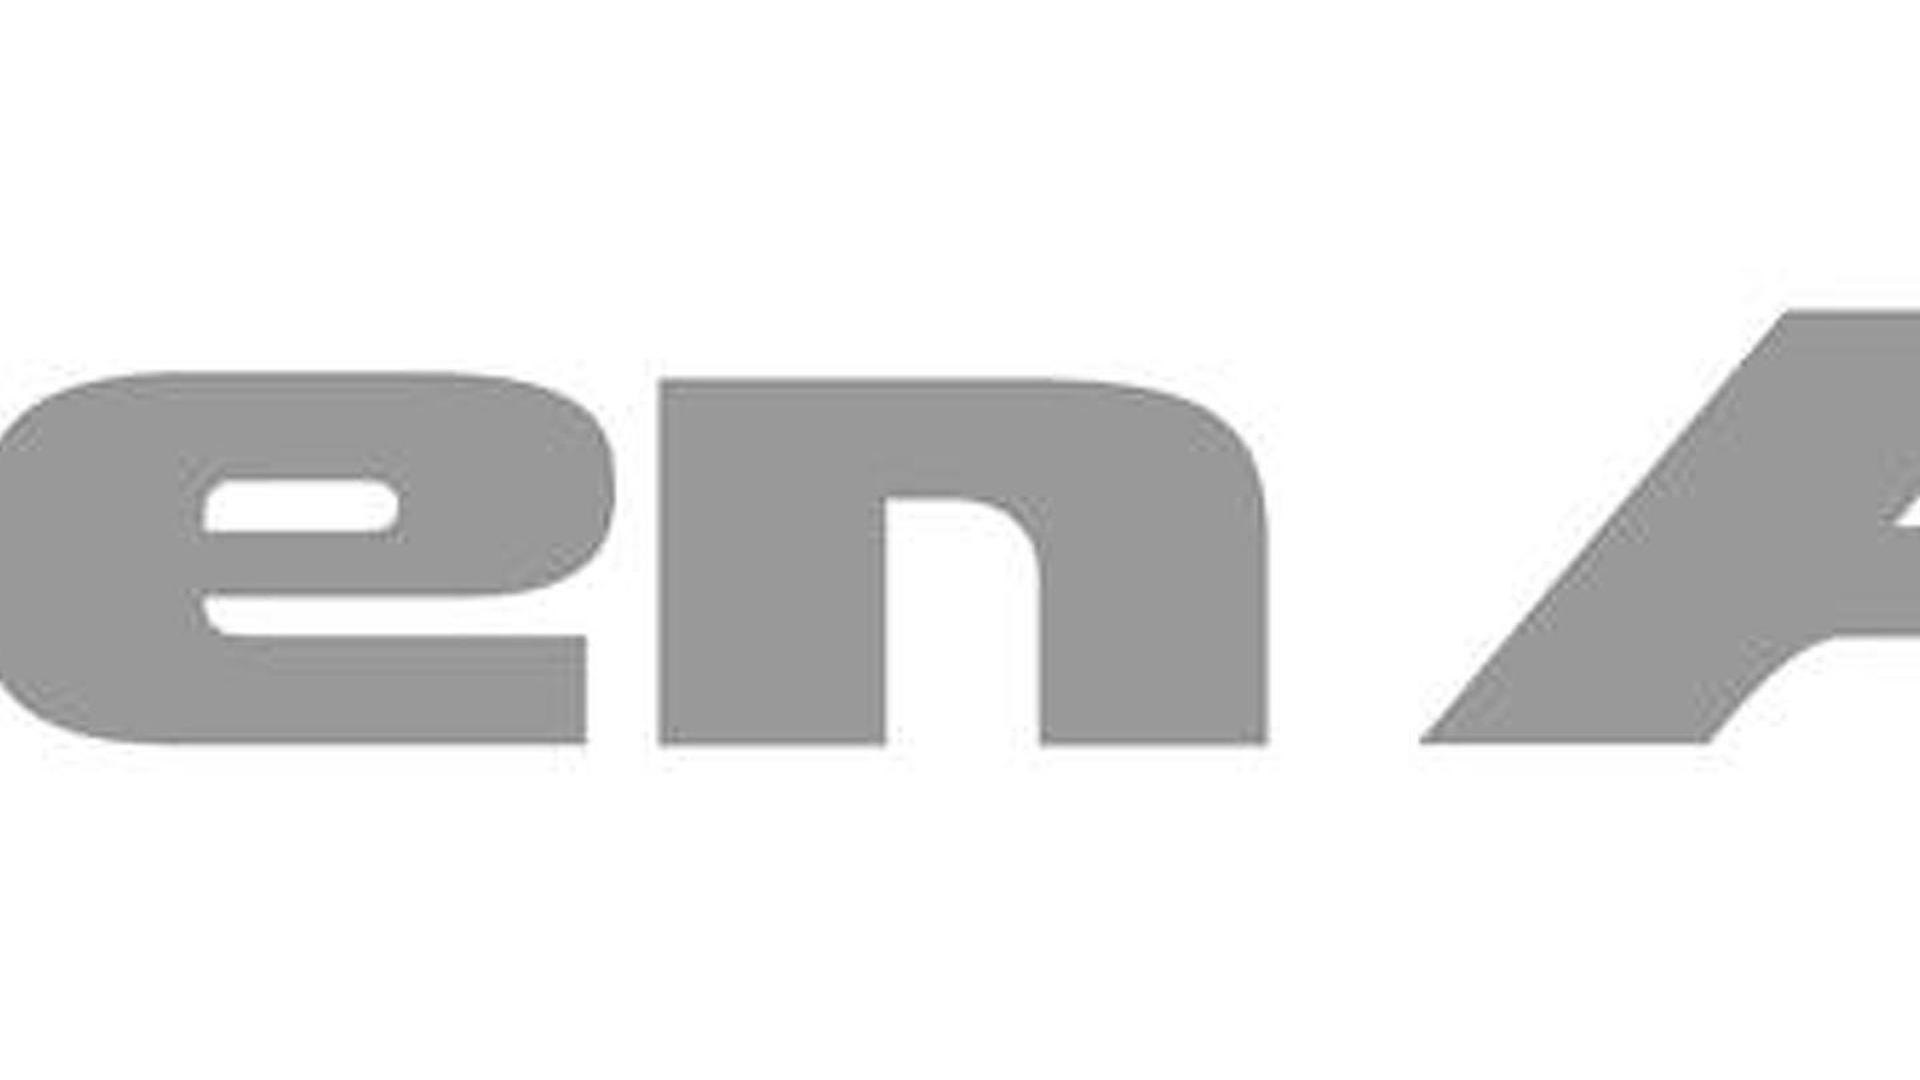 Mclaren P1 Gtr Logo >> Mclaren Teases Track Only P1 Gtr With 1 000 Ps